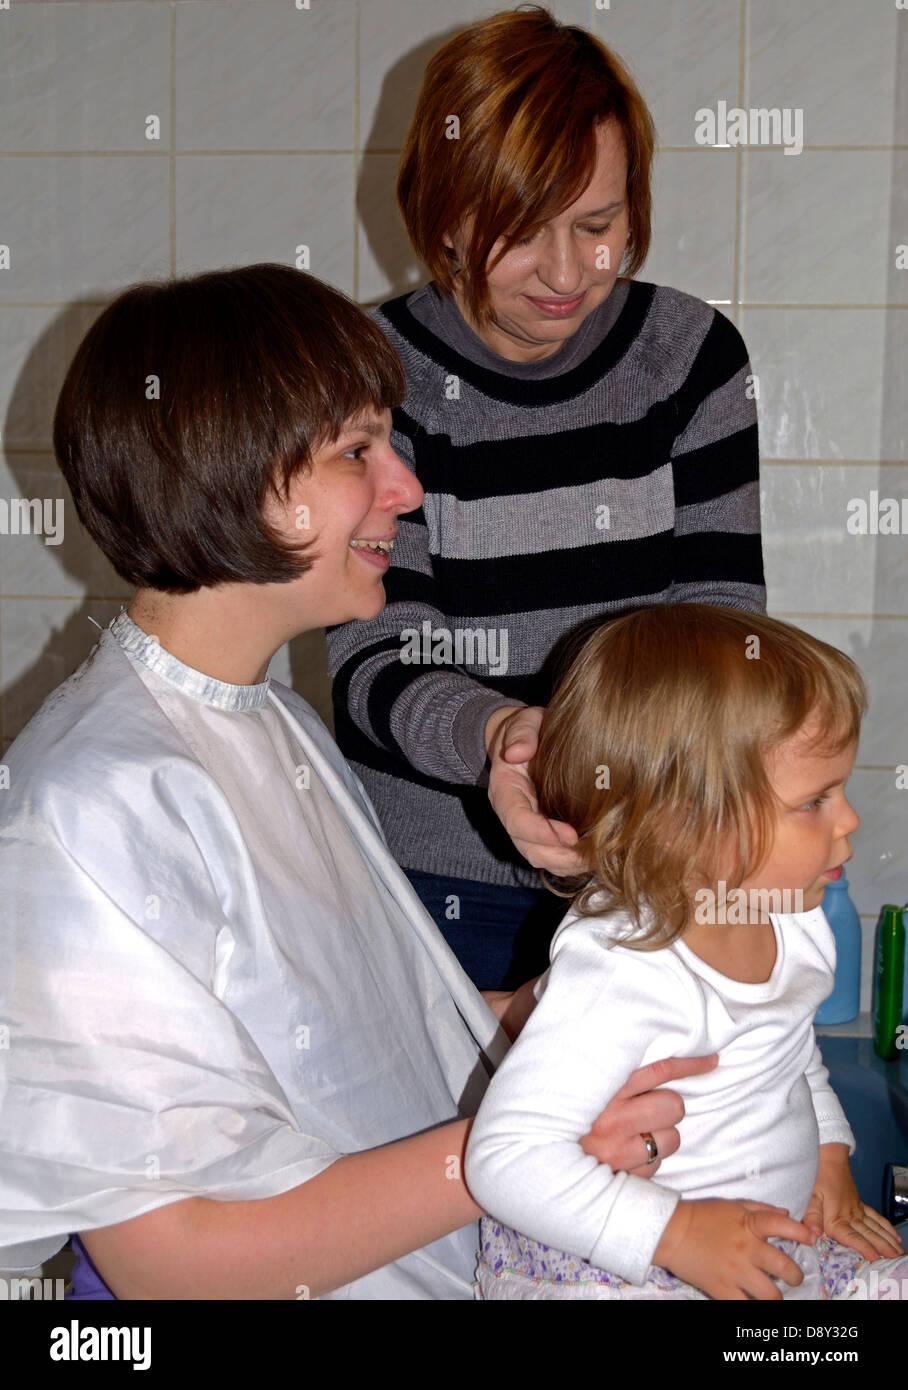 Baby Having First Hair Cut Stock Photos Baby Having First Hair Cut